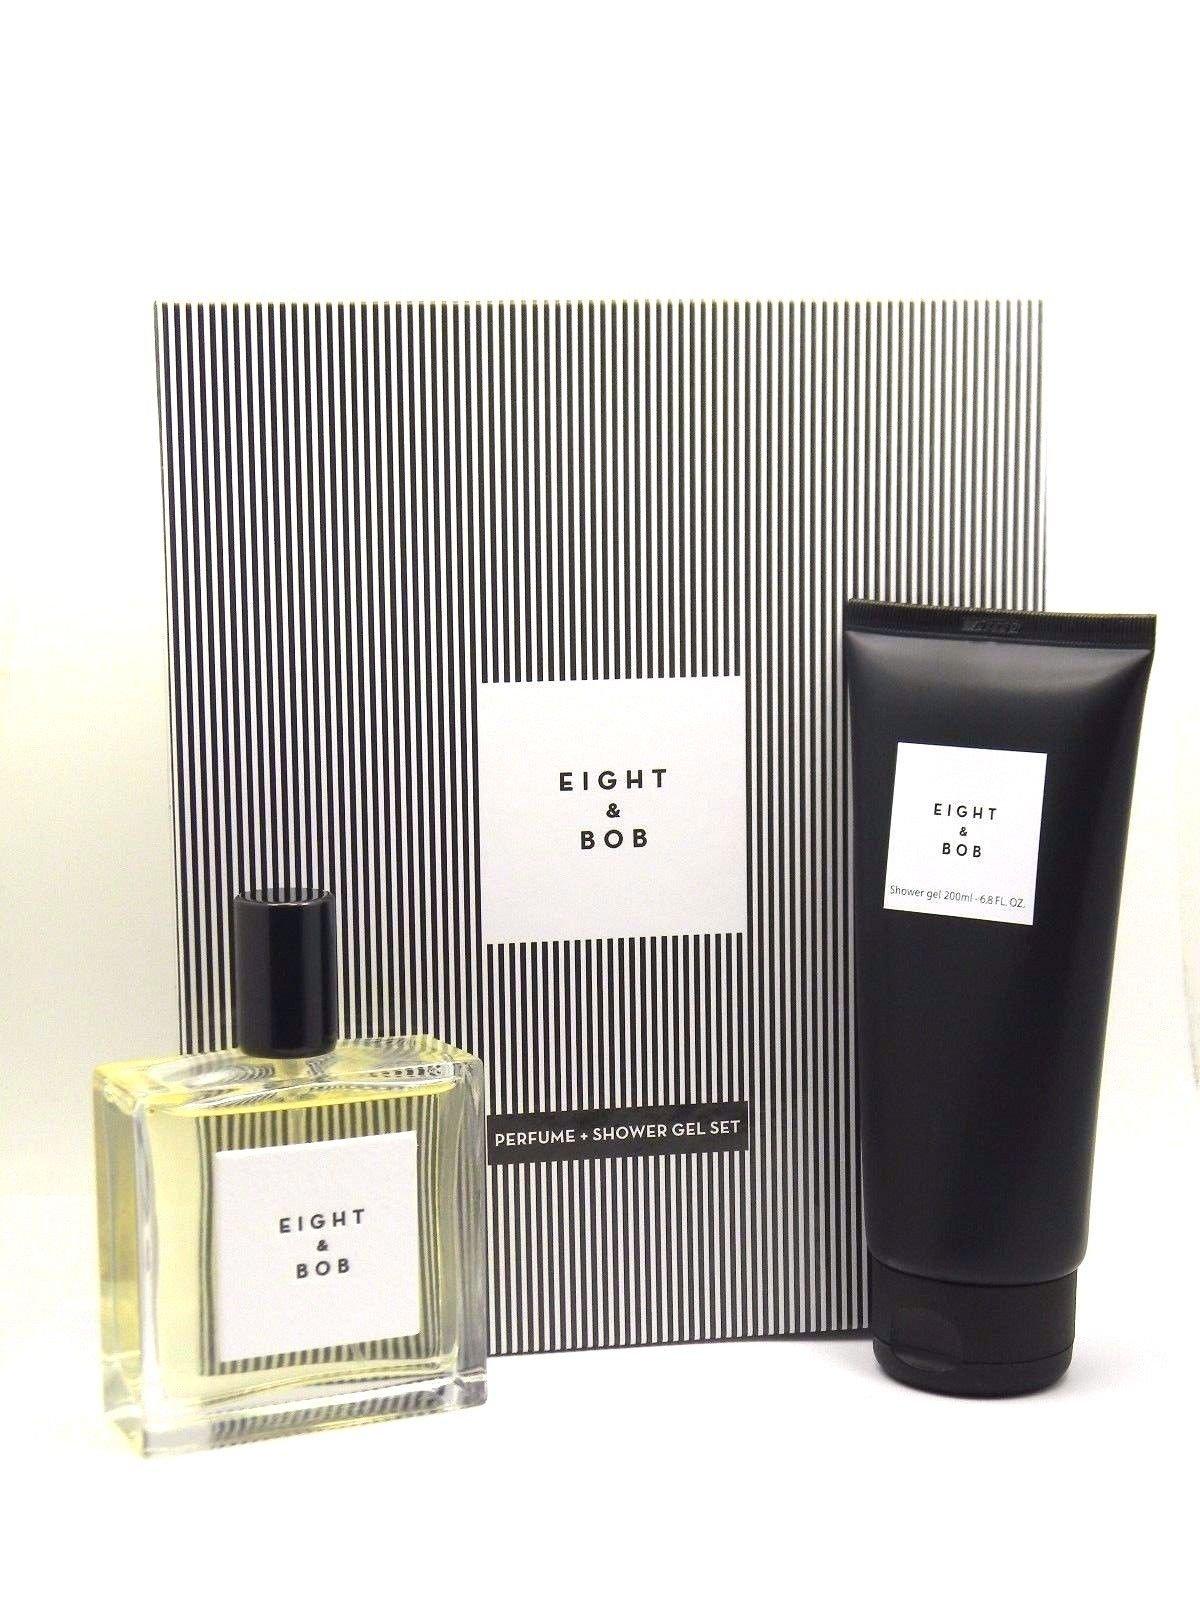 Eight & Bob Parfum and Shower Gel Set